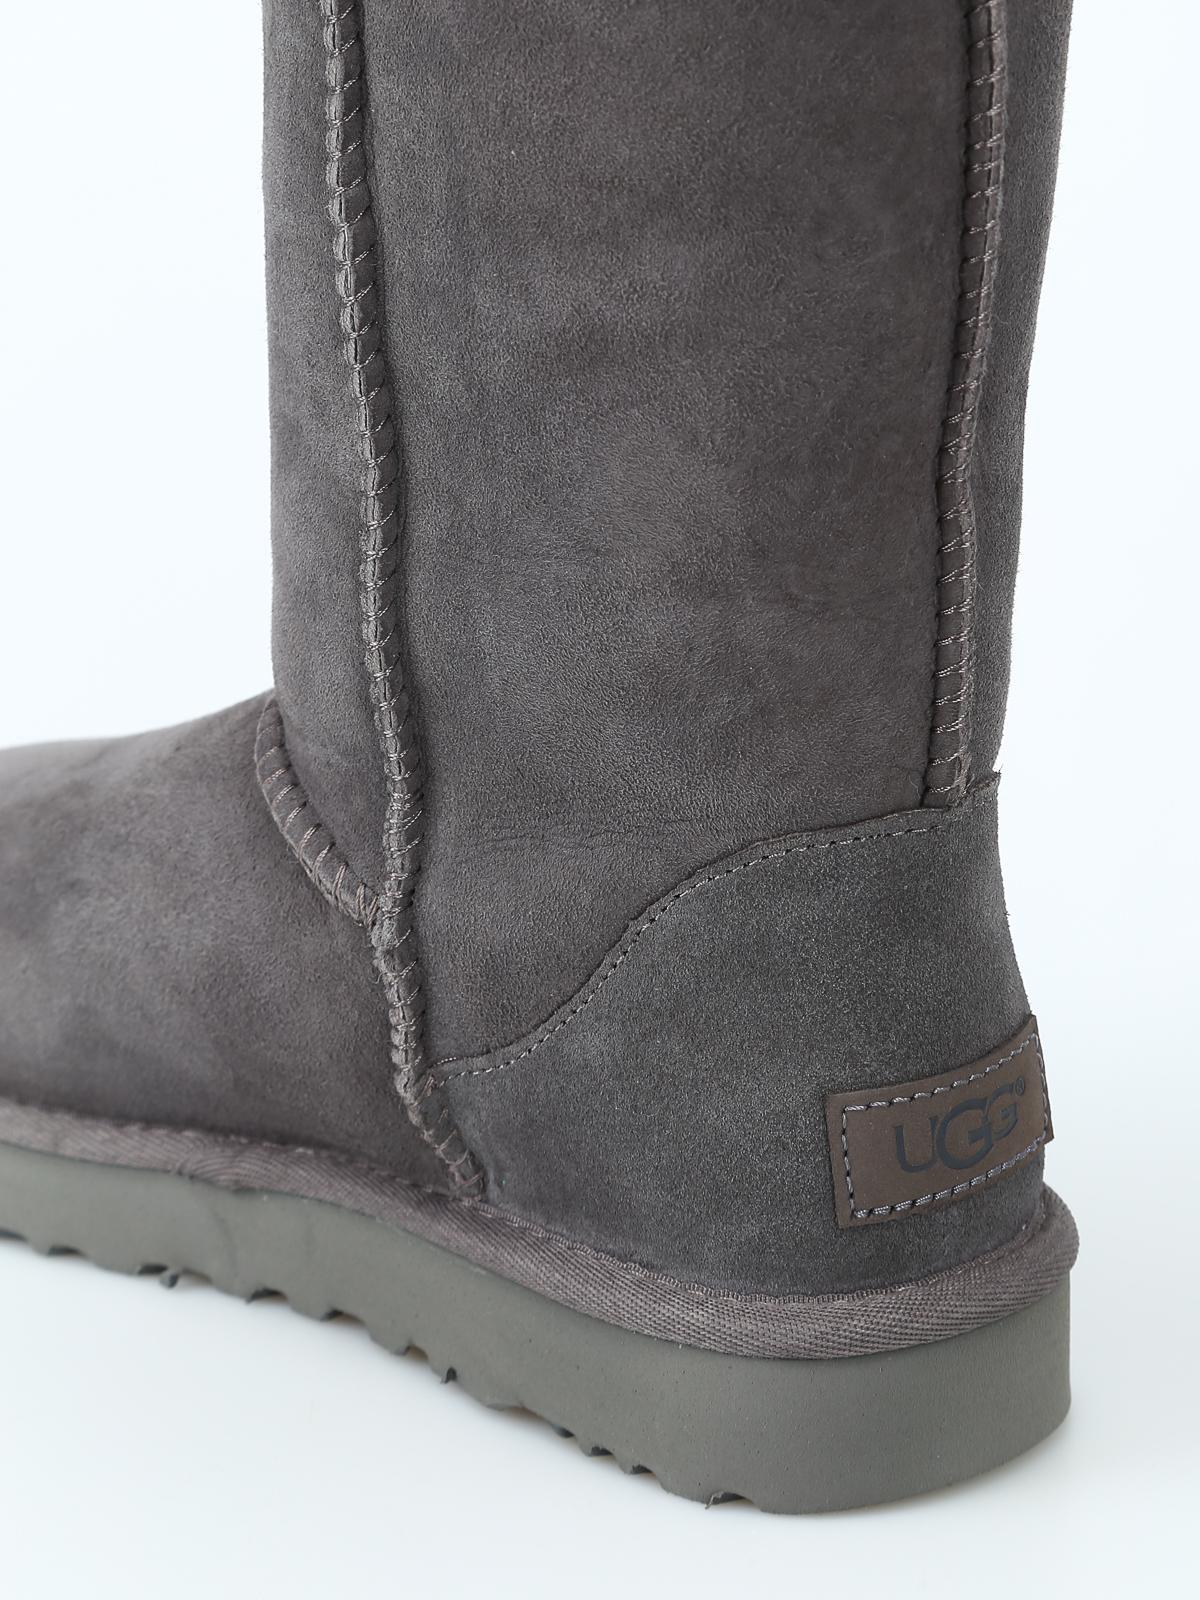 9f3a2c06242 Ugg - Classic Tall II grey boots - boots - 1016224 W Grey   iKRIX.com